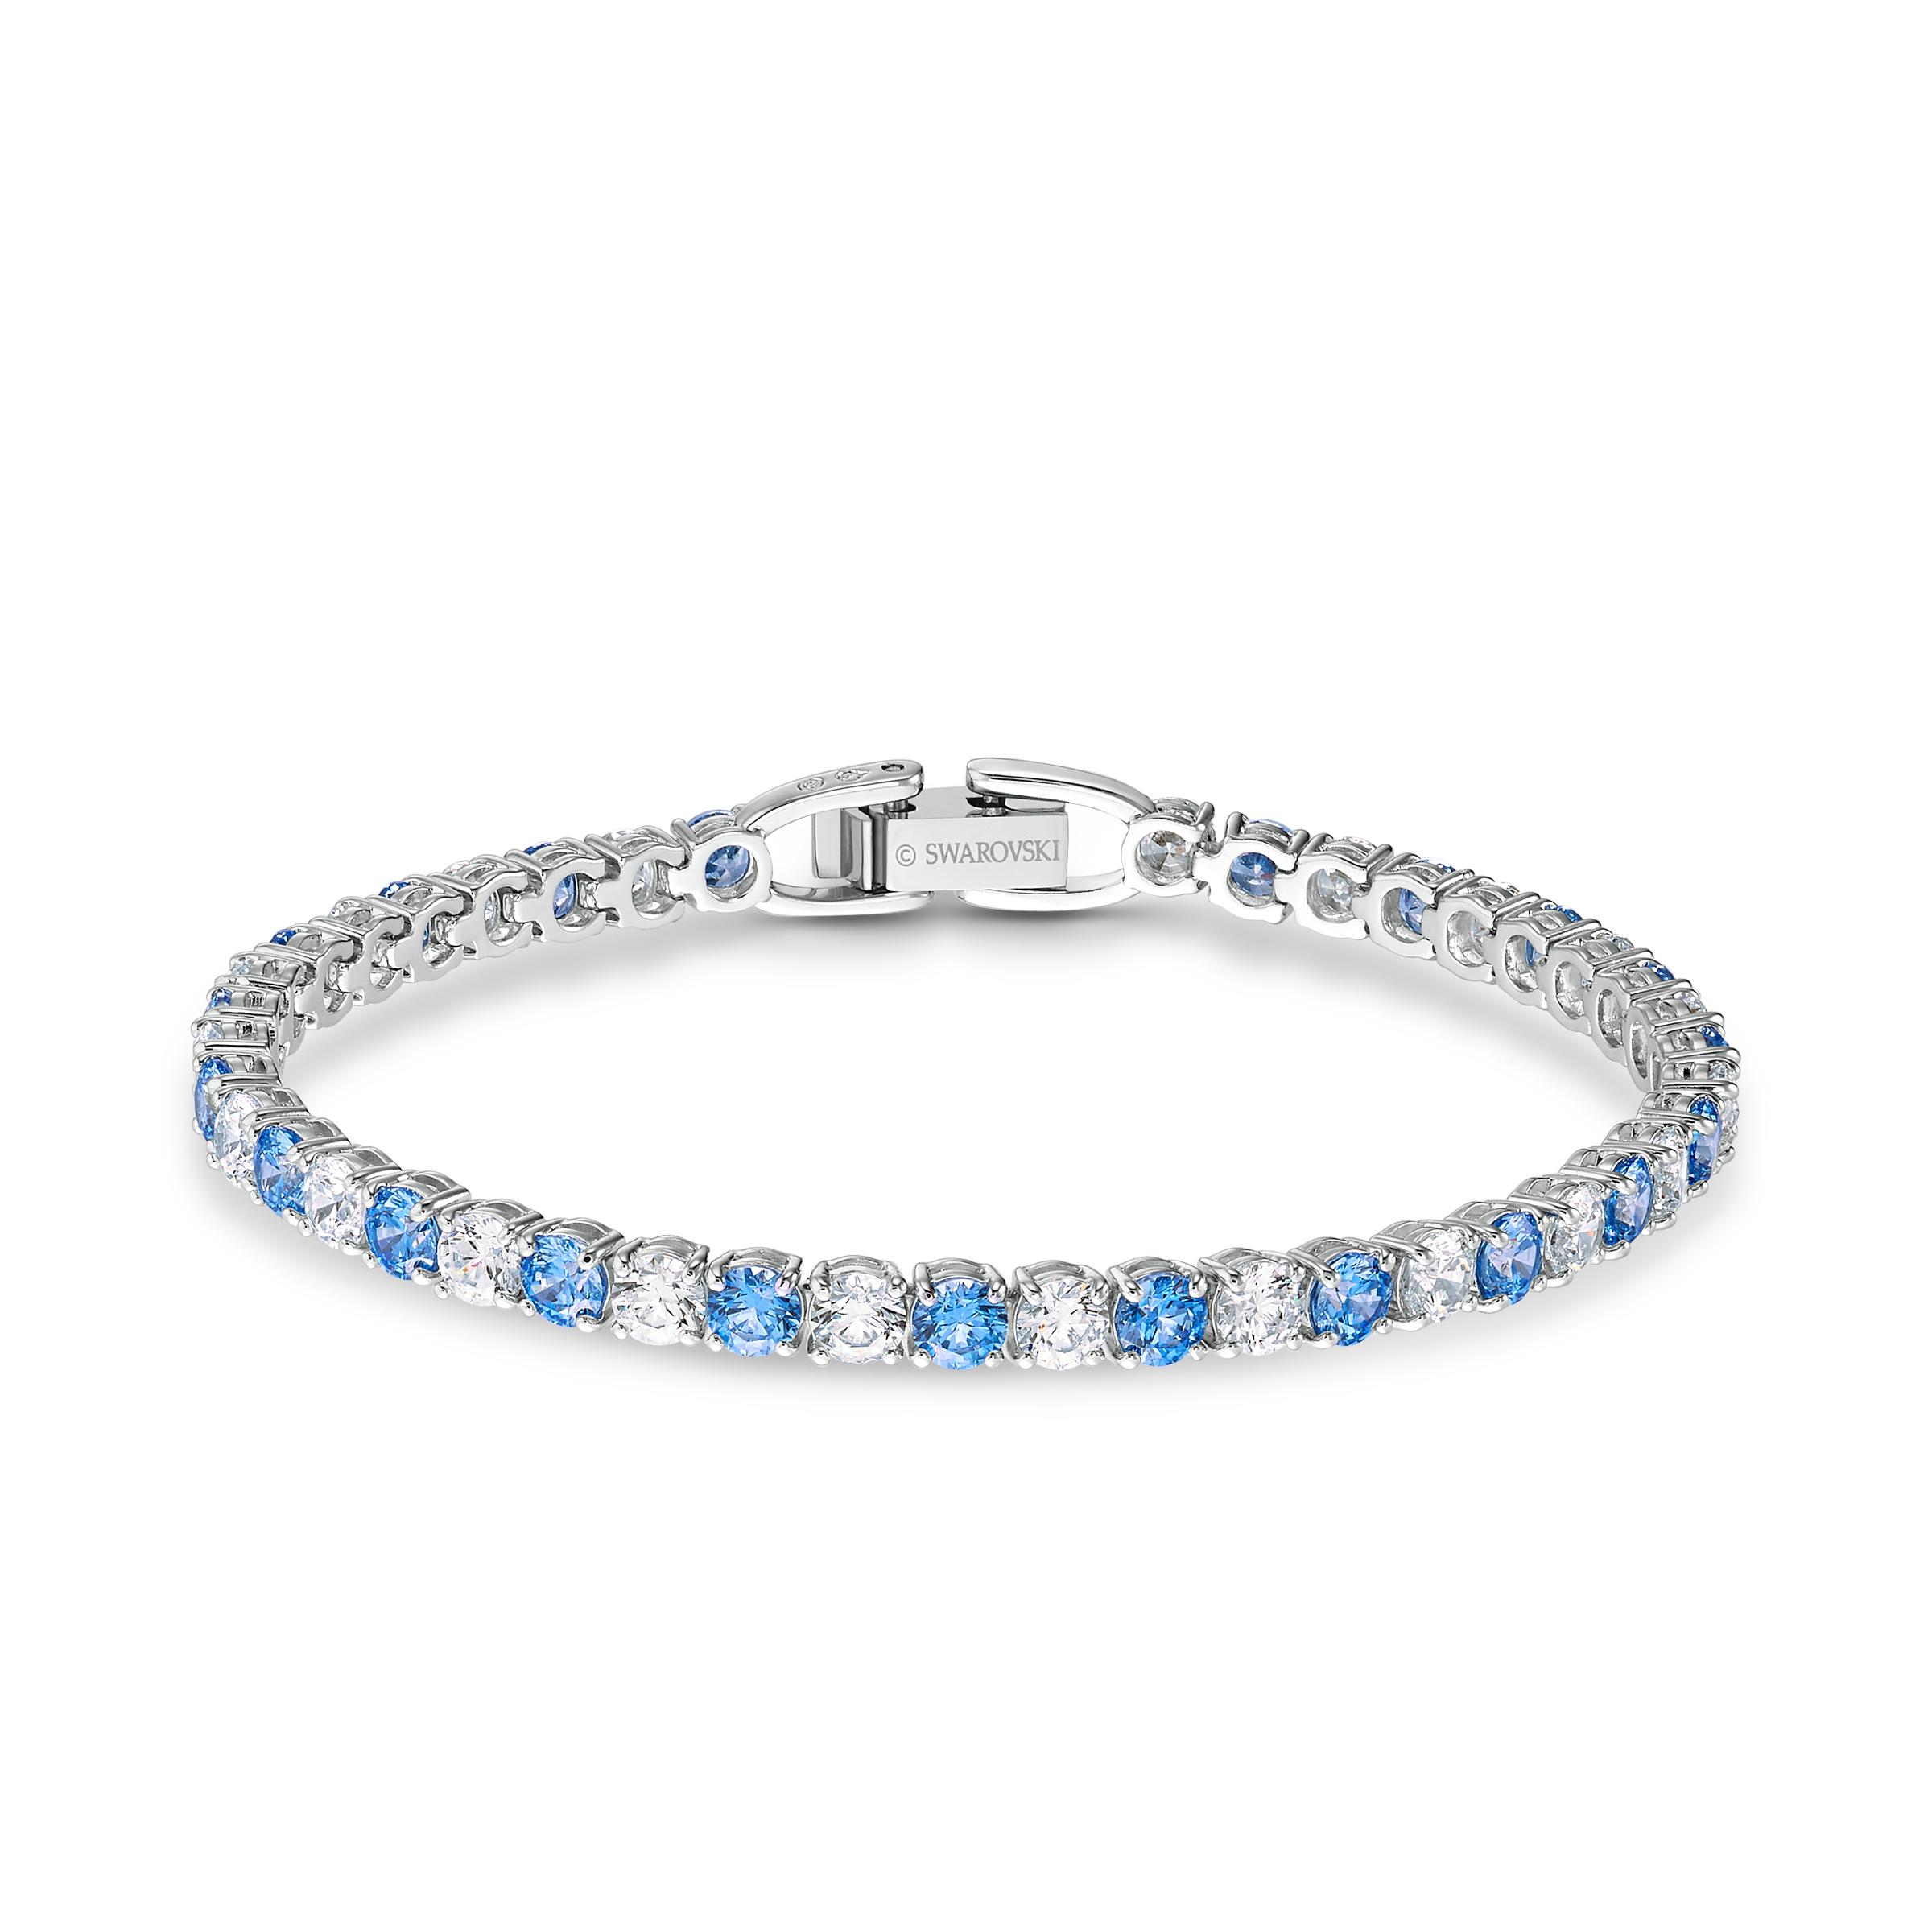 tennis-bracelet-5536469-jpg-jpg-2